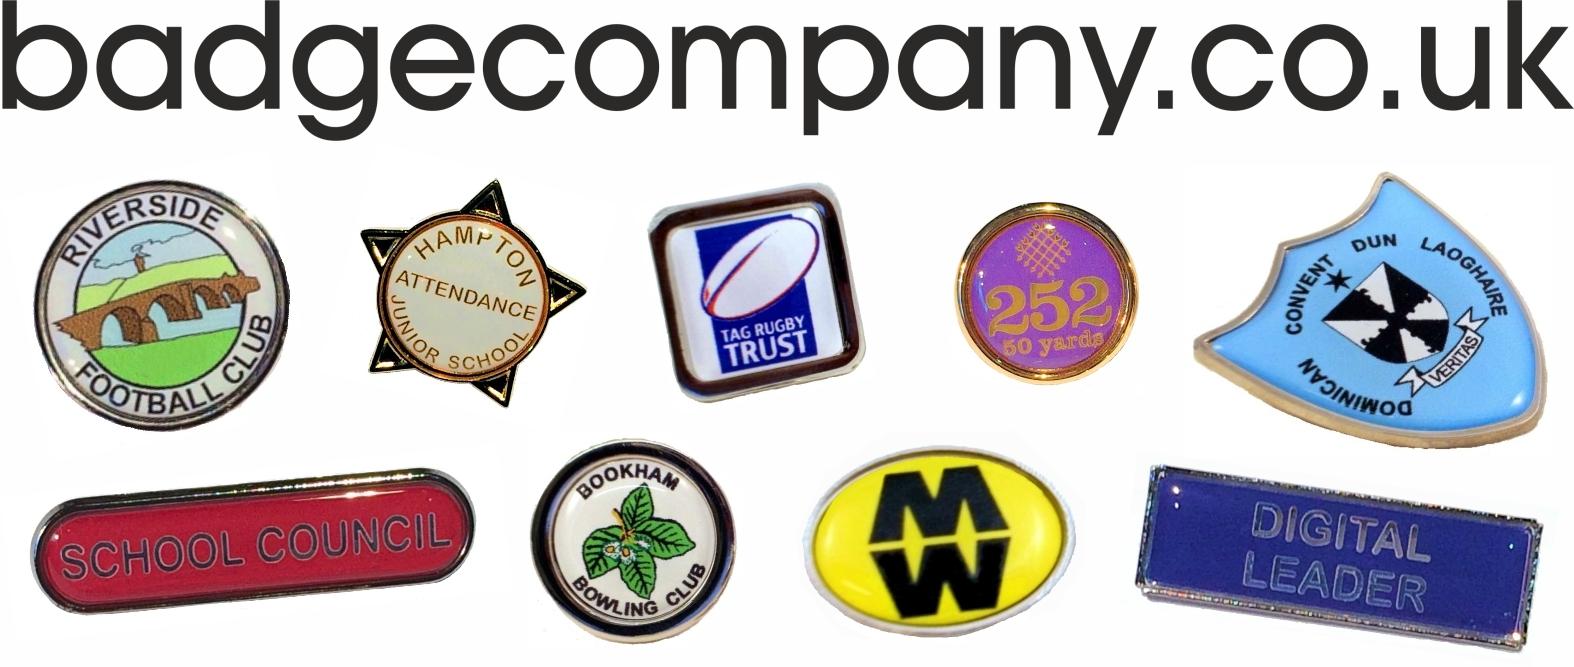 The Badge Company